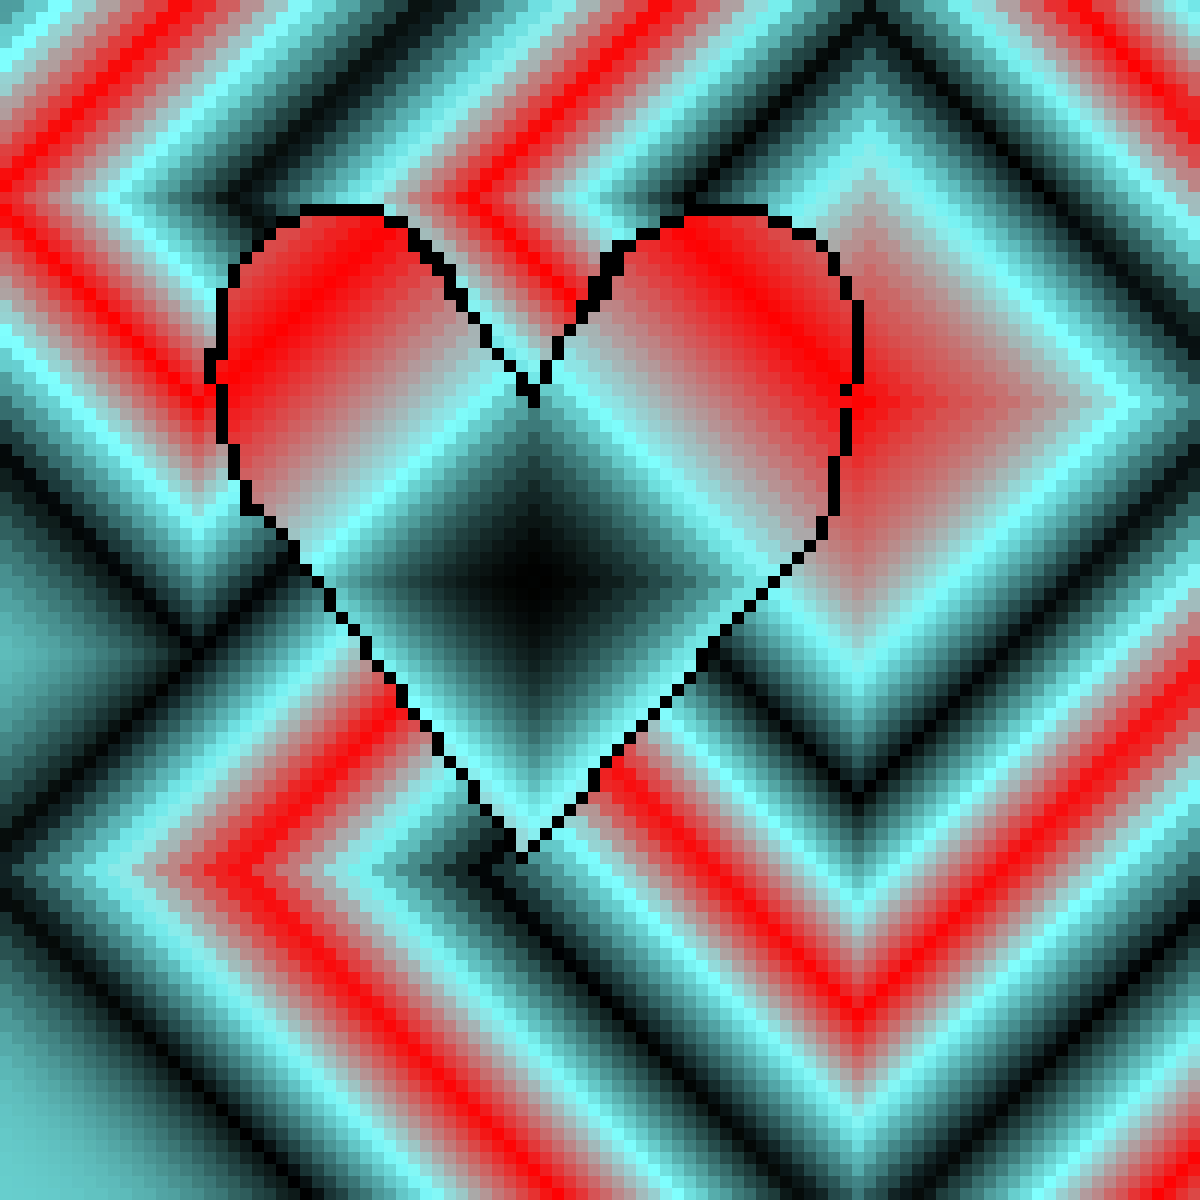 heart by PatatoMaeo